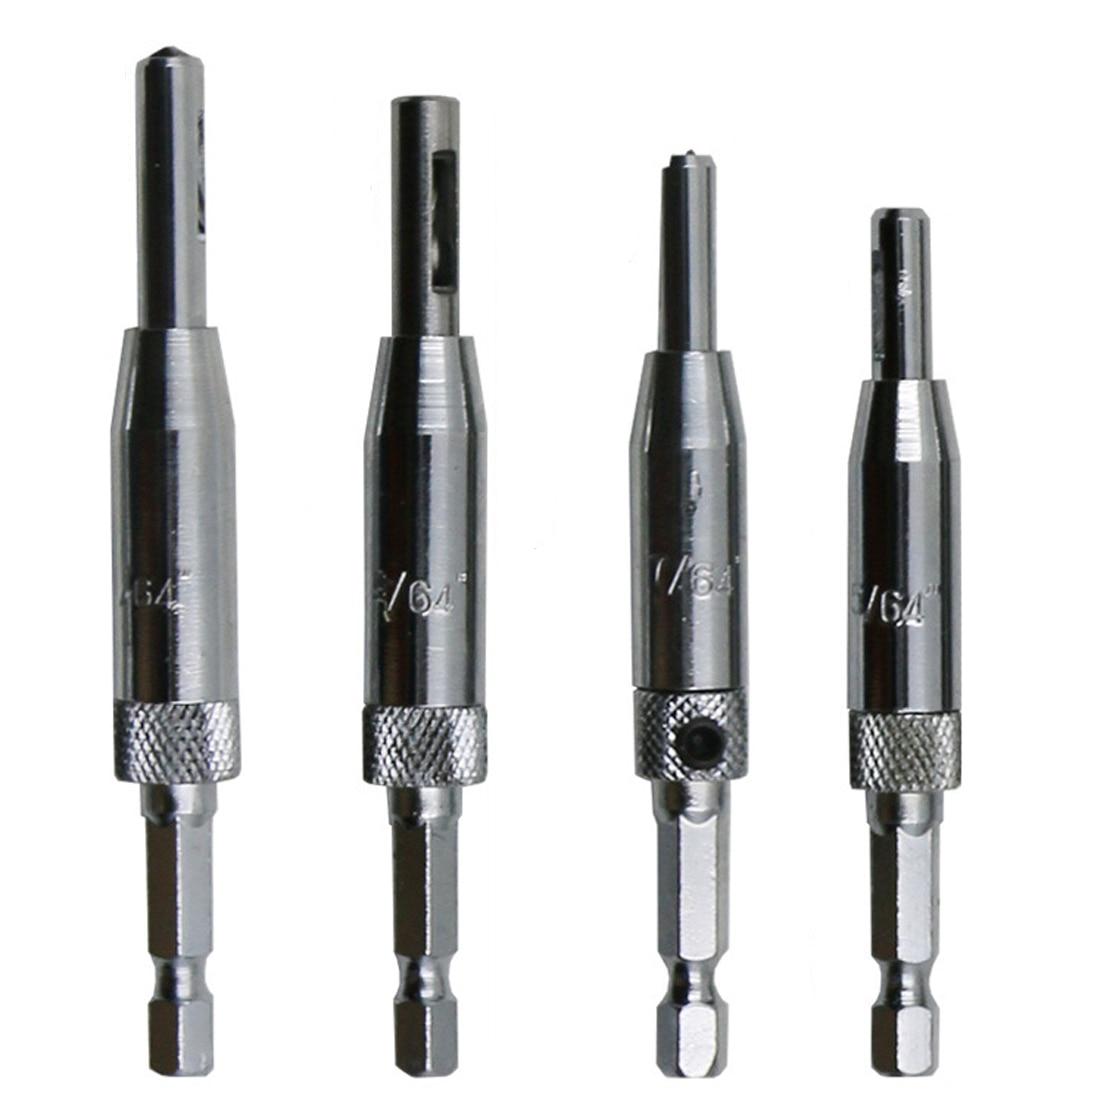 4pcs/lot HSS Self Centering Drill Bits Hinge Drill Bit Door Cabinet 5/64 7/64 9/64 11/64 For Carpenter Furniture Makers